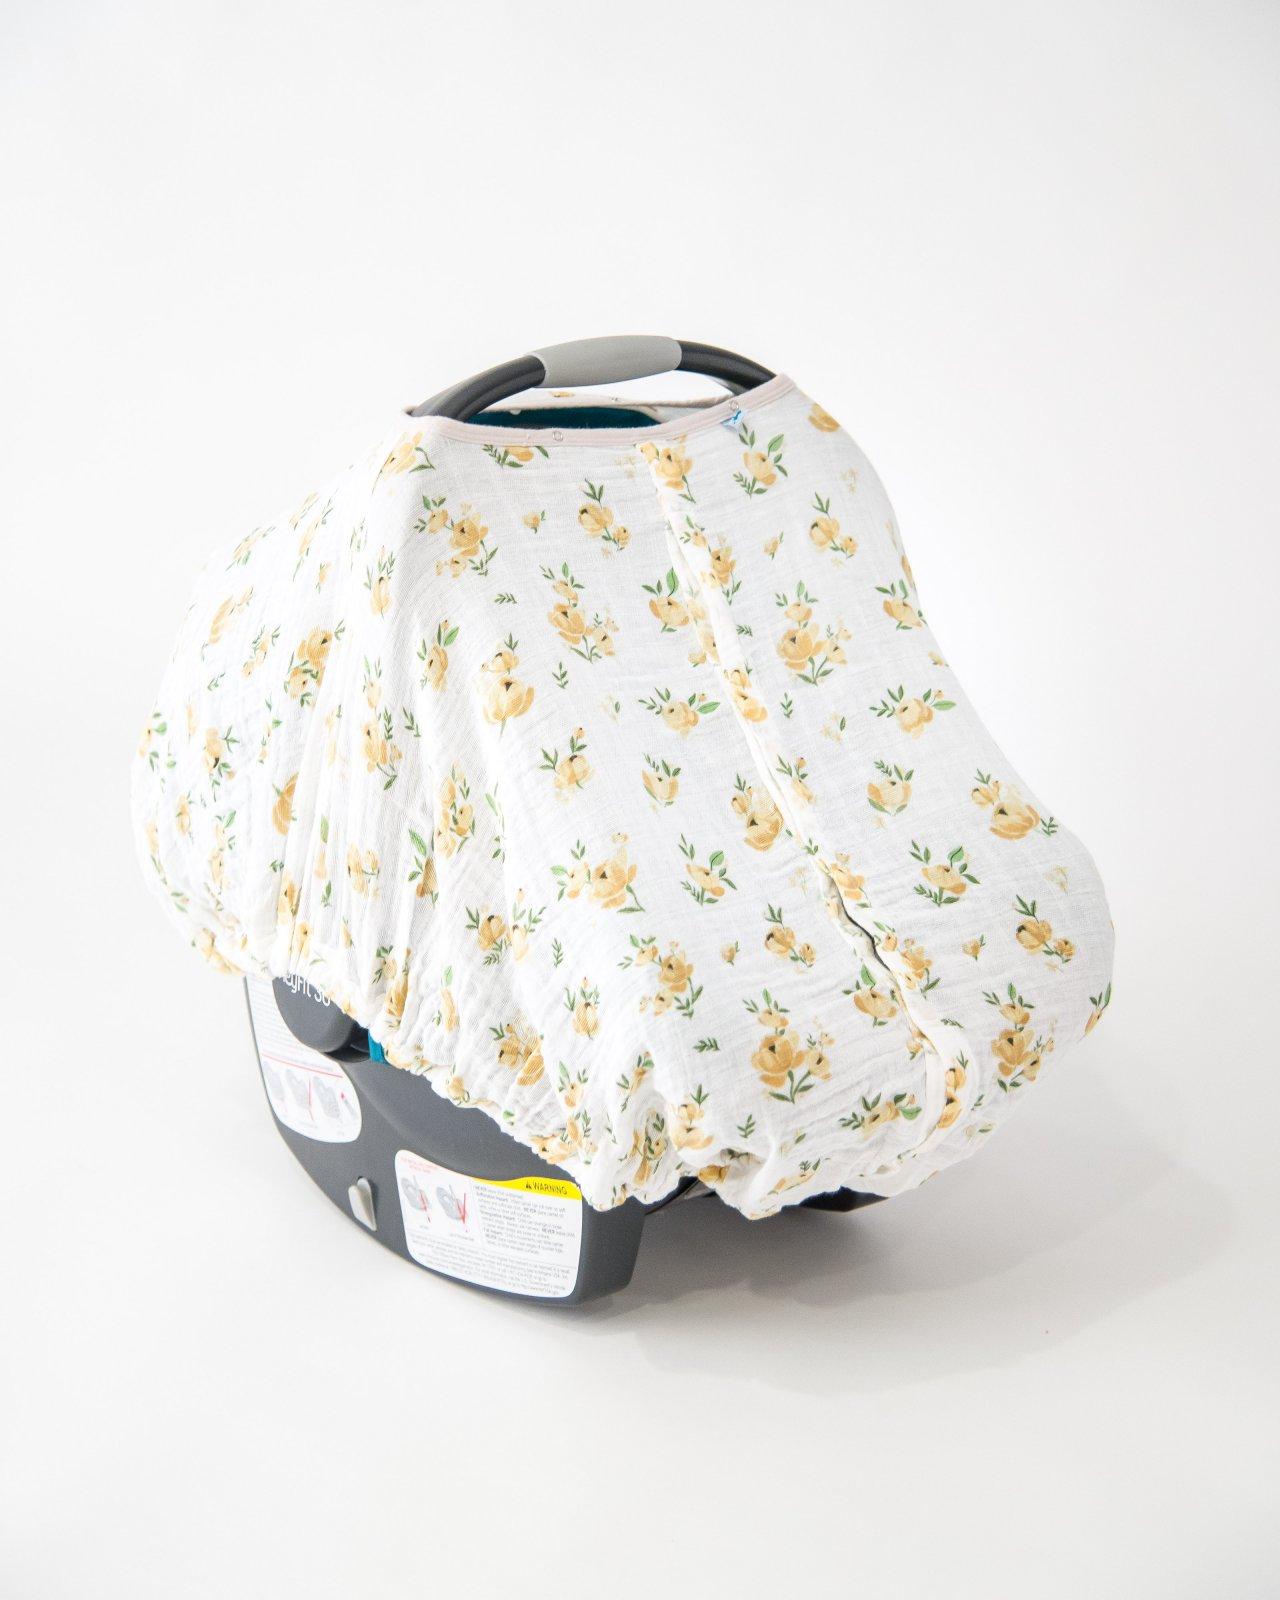 Little Unicorn Cotton Muslin Car Seat Canopy - Yellow Rose